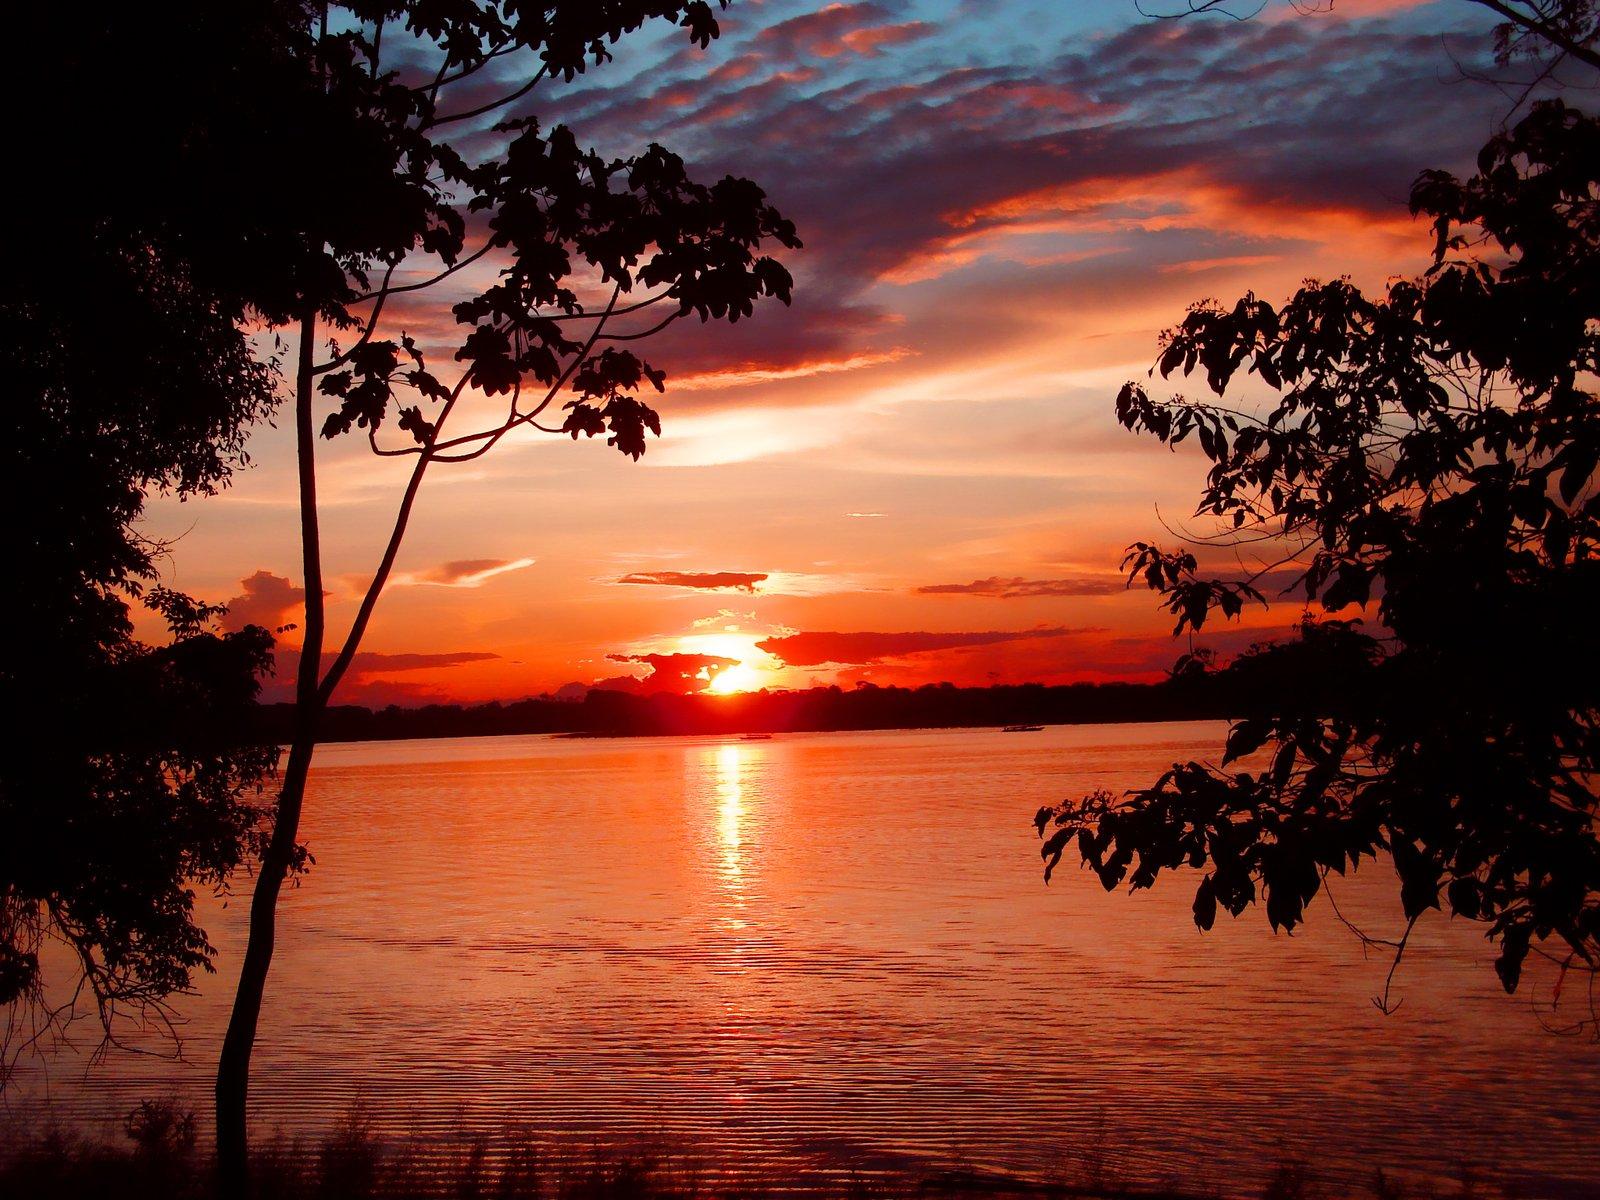 Free Sunset Jungle Stock Photo Freeimages Com